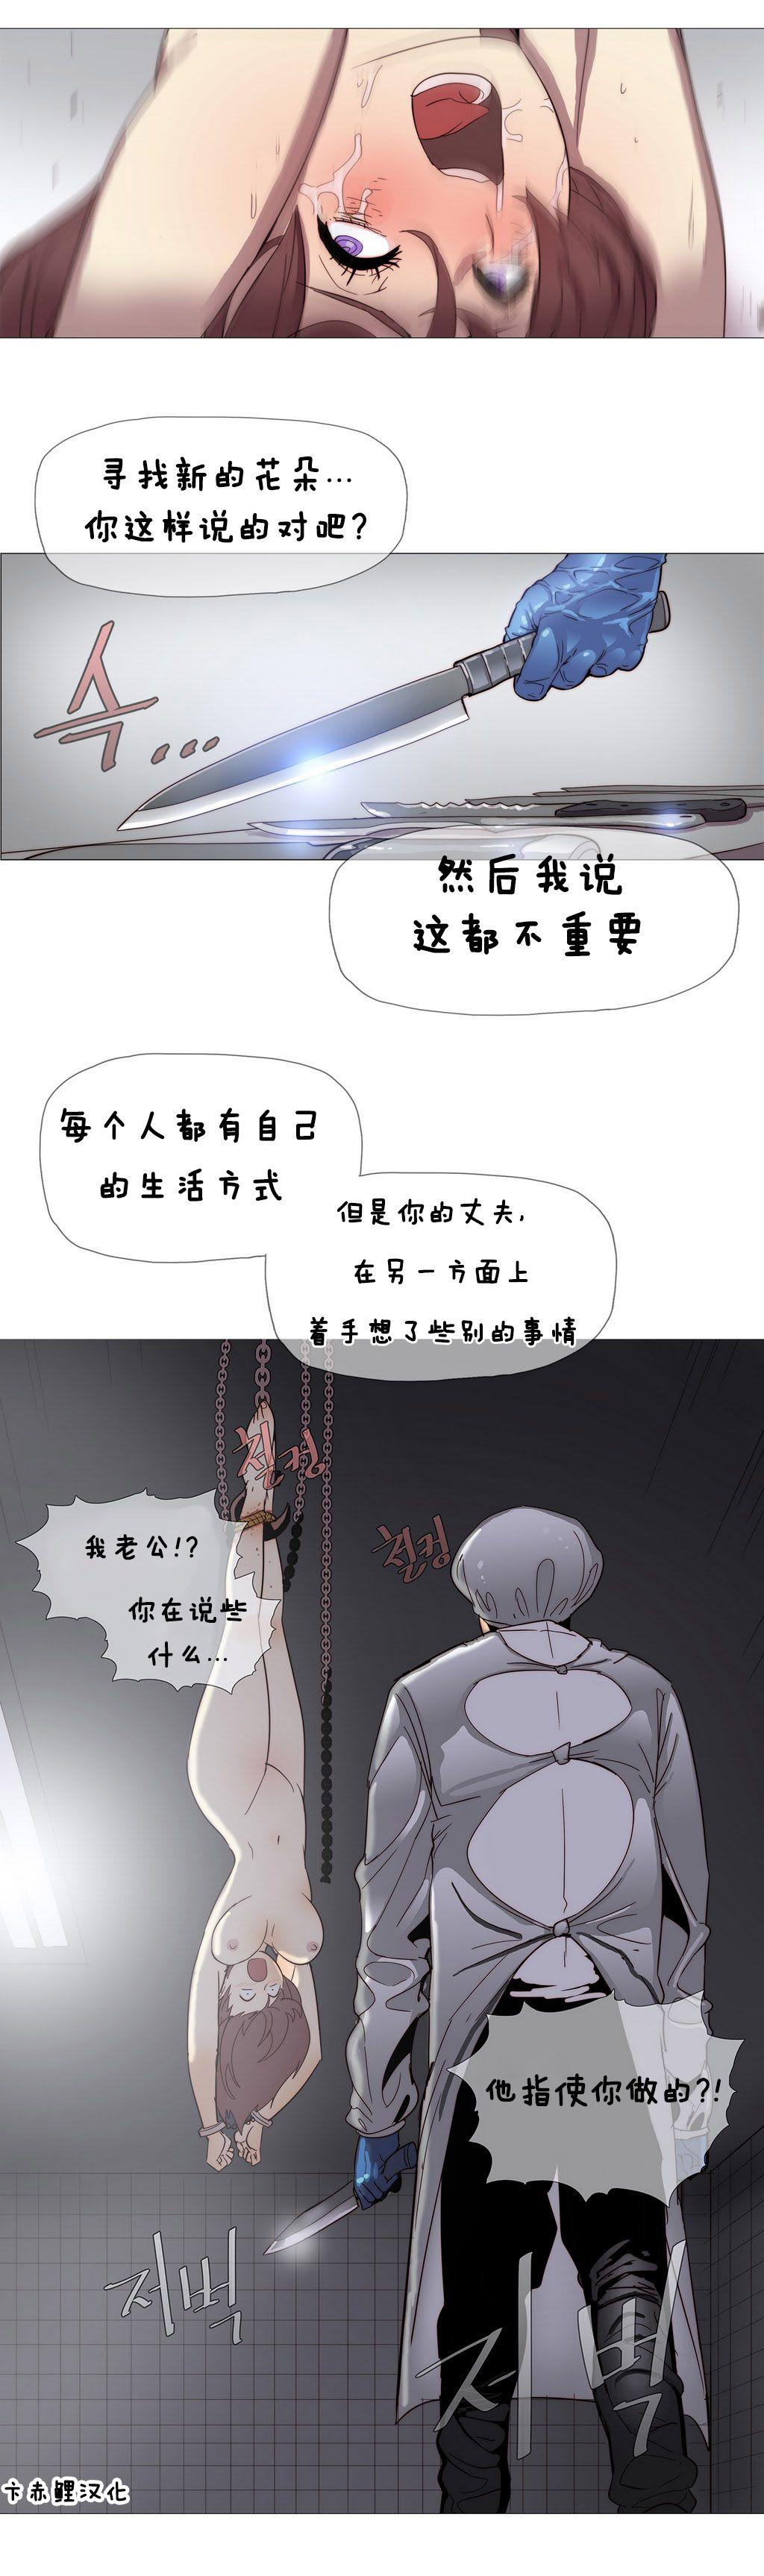 HouseHold Affairs 【卞赤鲤个人汉化】1~33话(持续更新中) 40